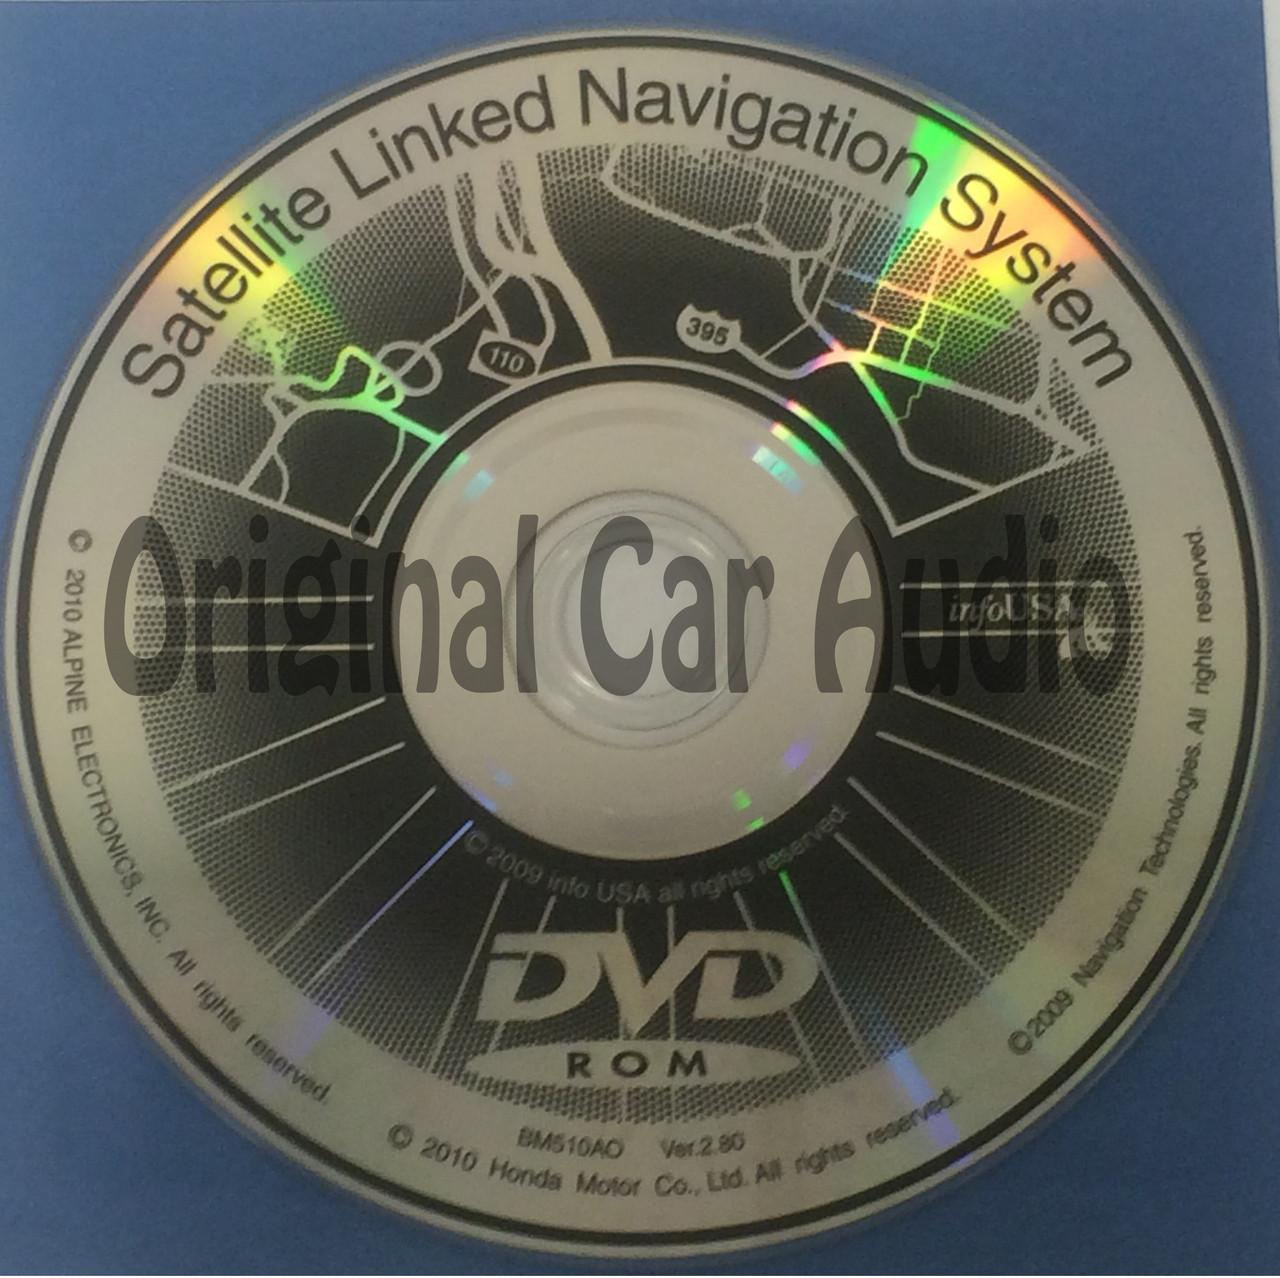 Acura Honda Satellite Navigation System GPS DVD Drive Disc